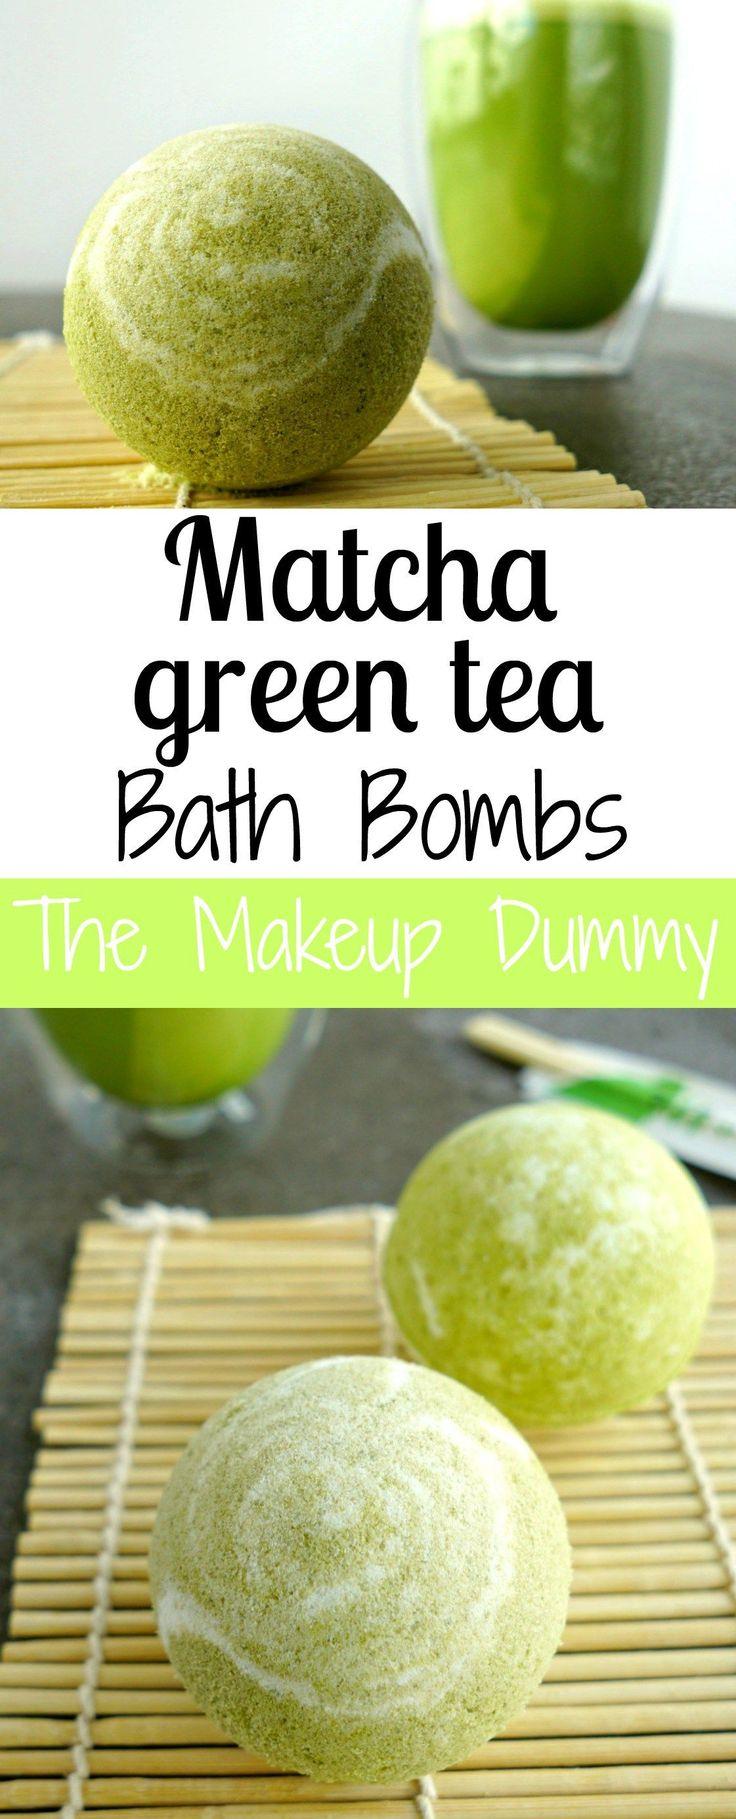 These look AMAZING! How To make your own DIY Matcha Green Tea Bath Bombs! Tutori...